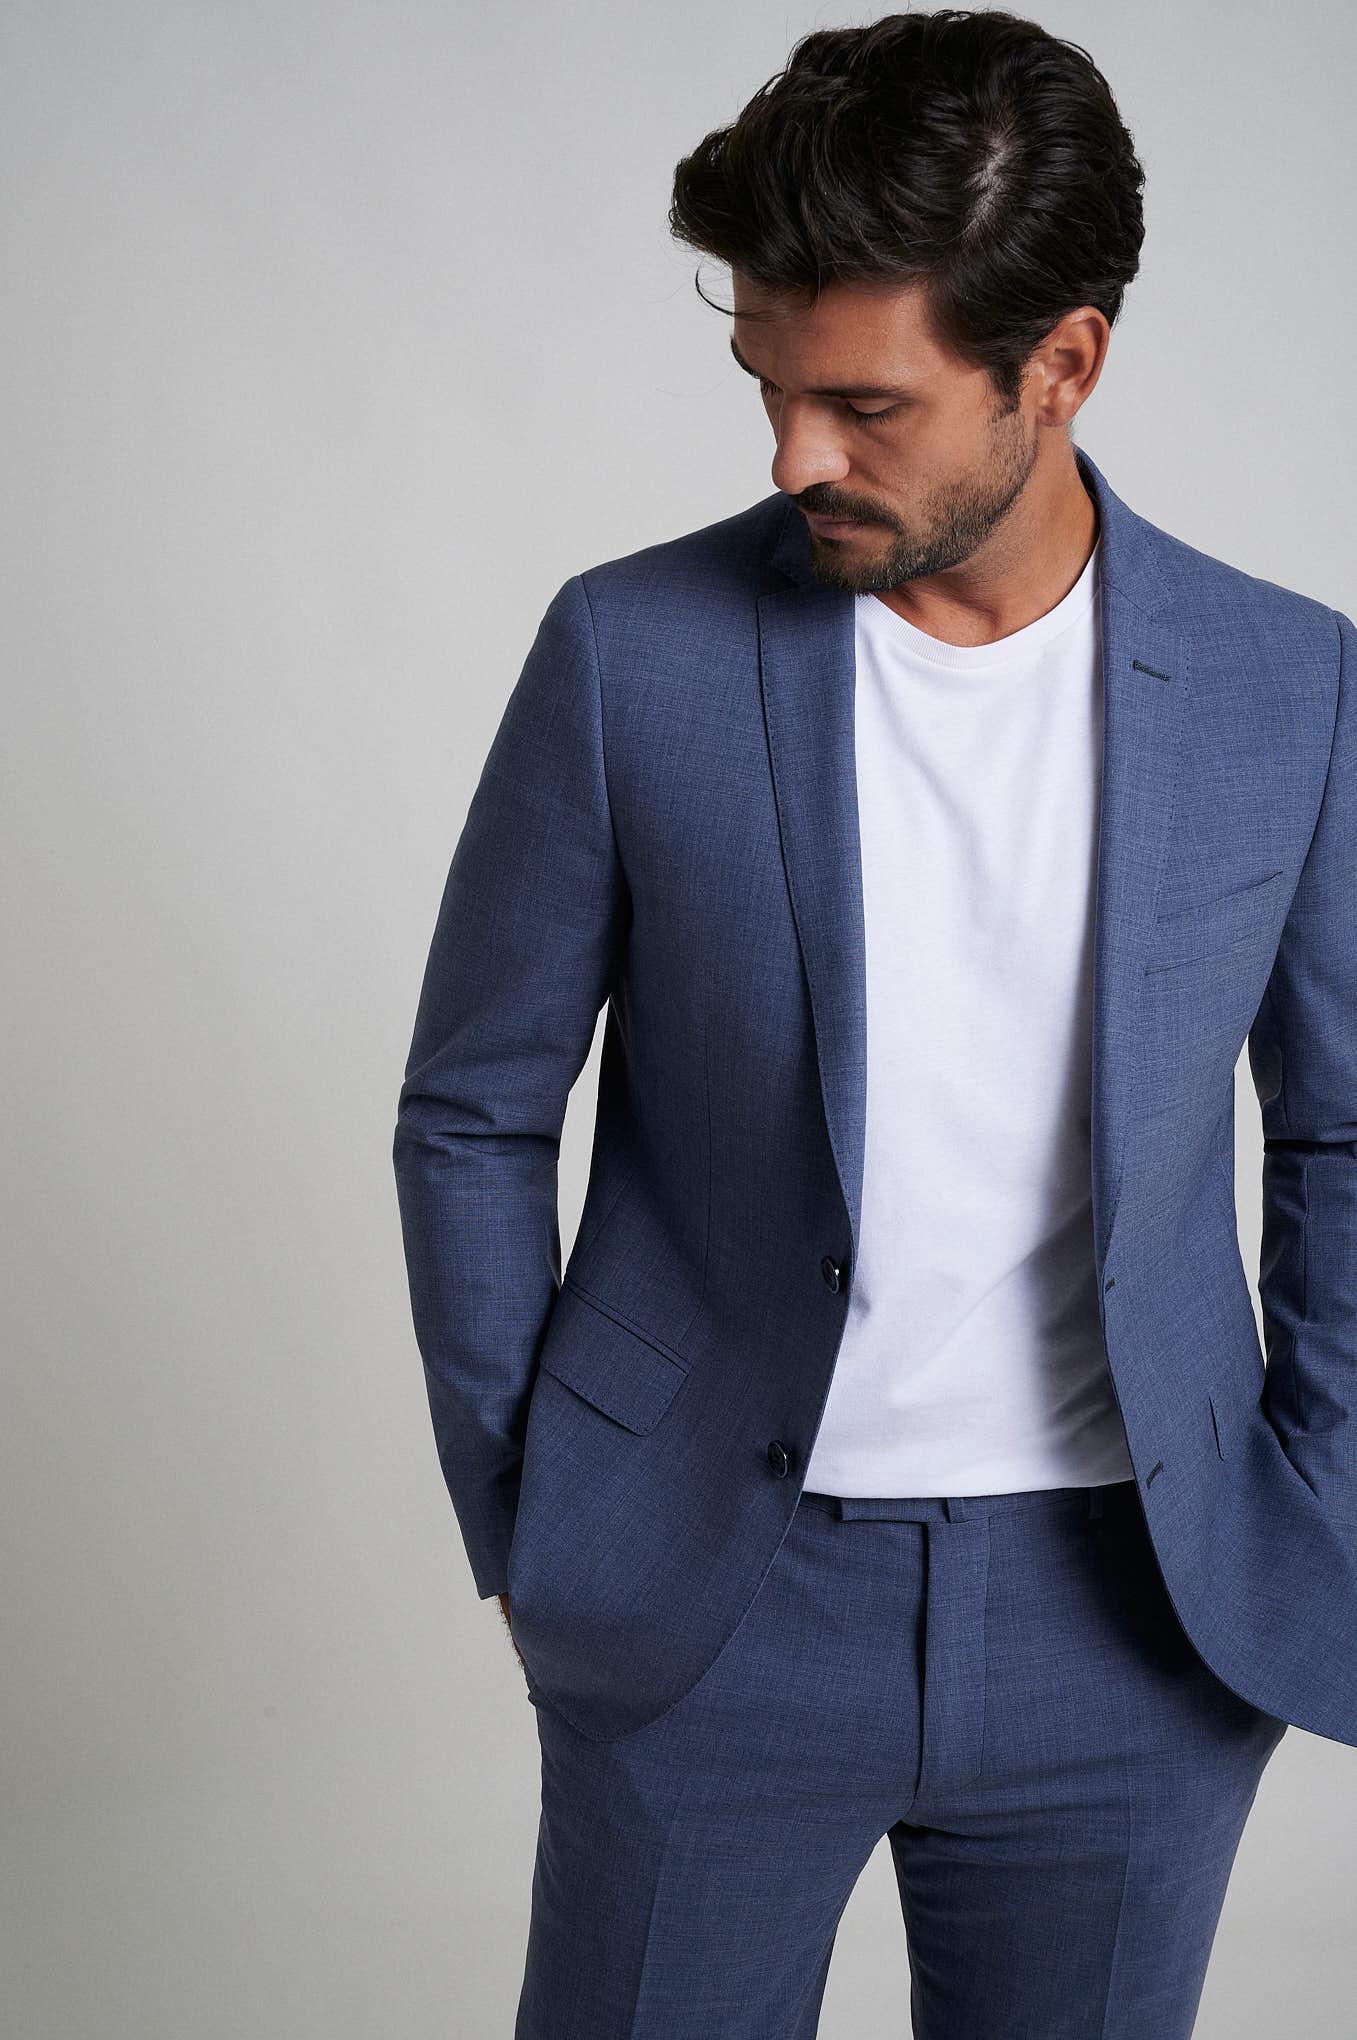 Suit Medium Blue Formal Man